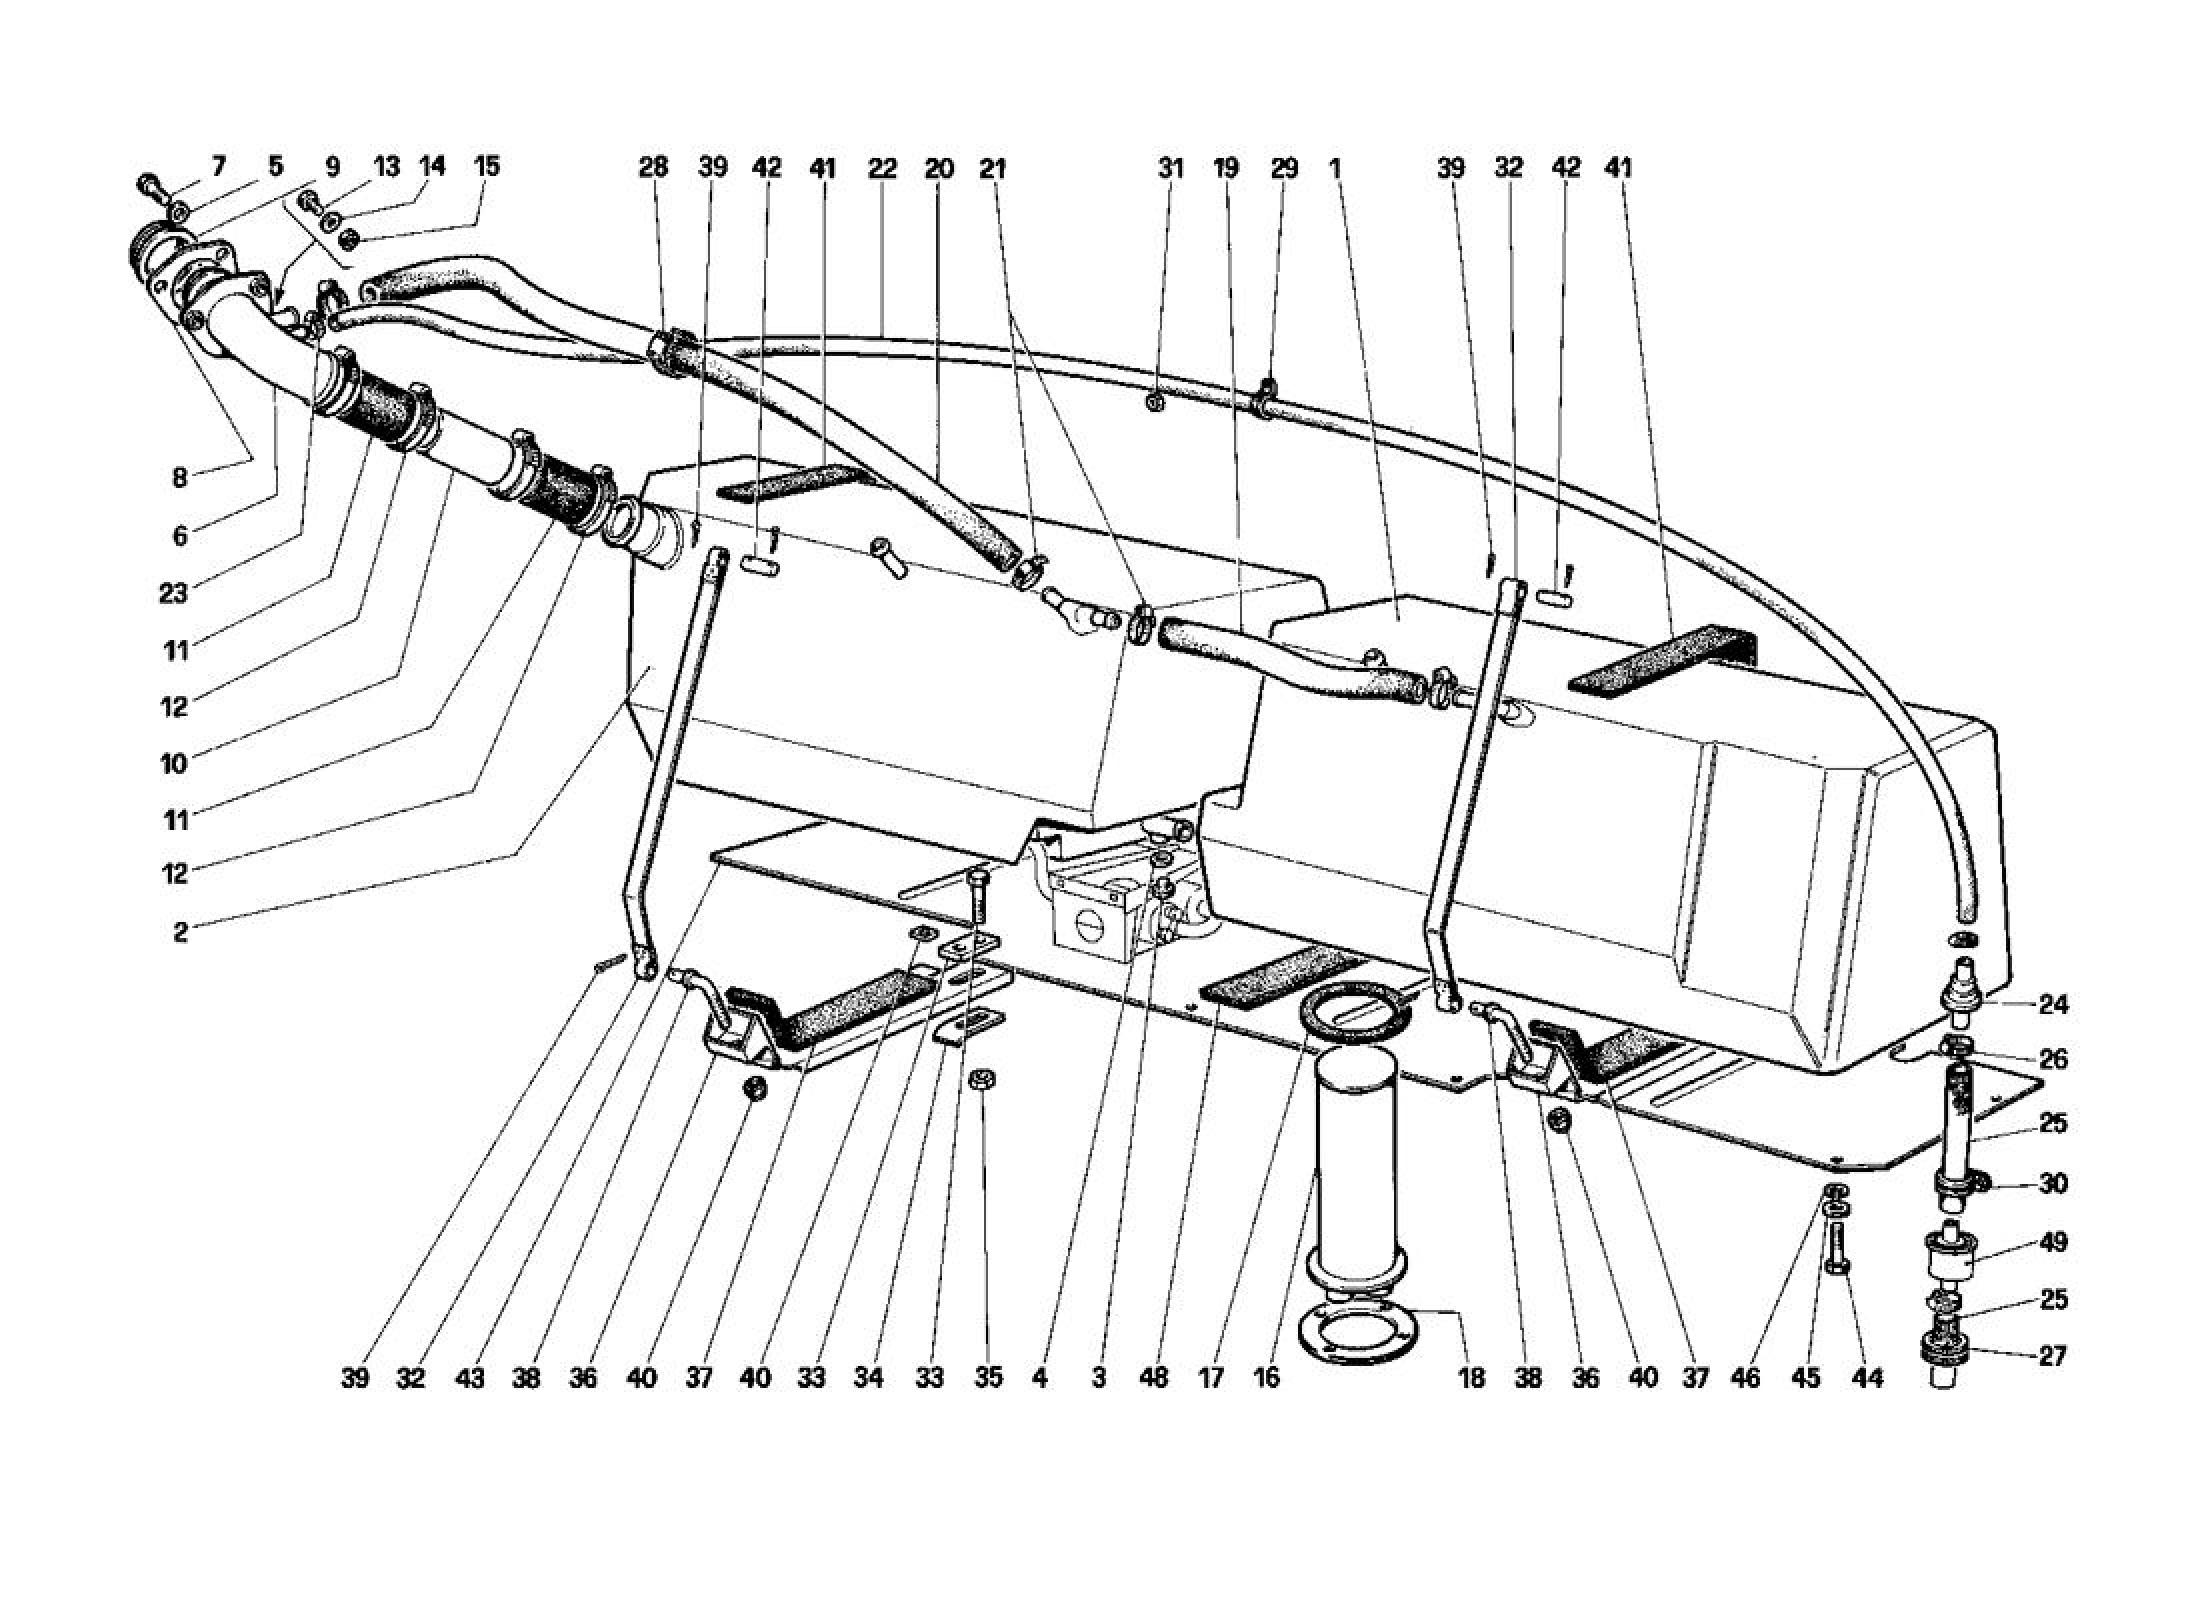 Ferrari Testarossa (1987) FUEL TANKS (NOT FOR U.S. AND SA